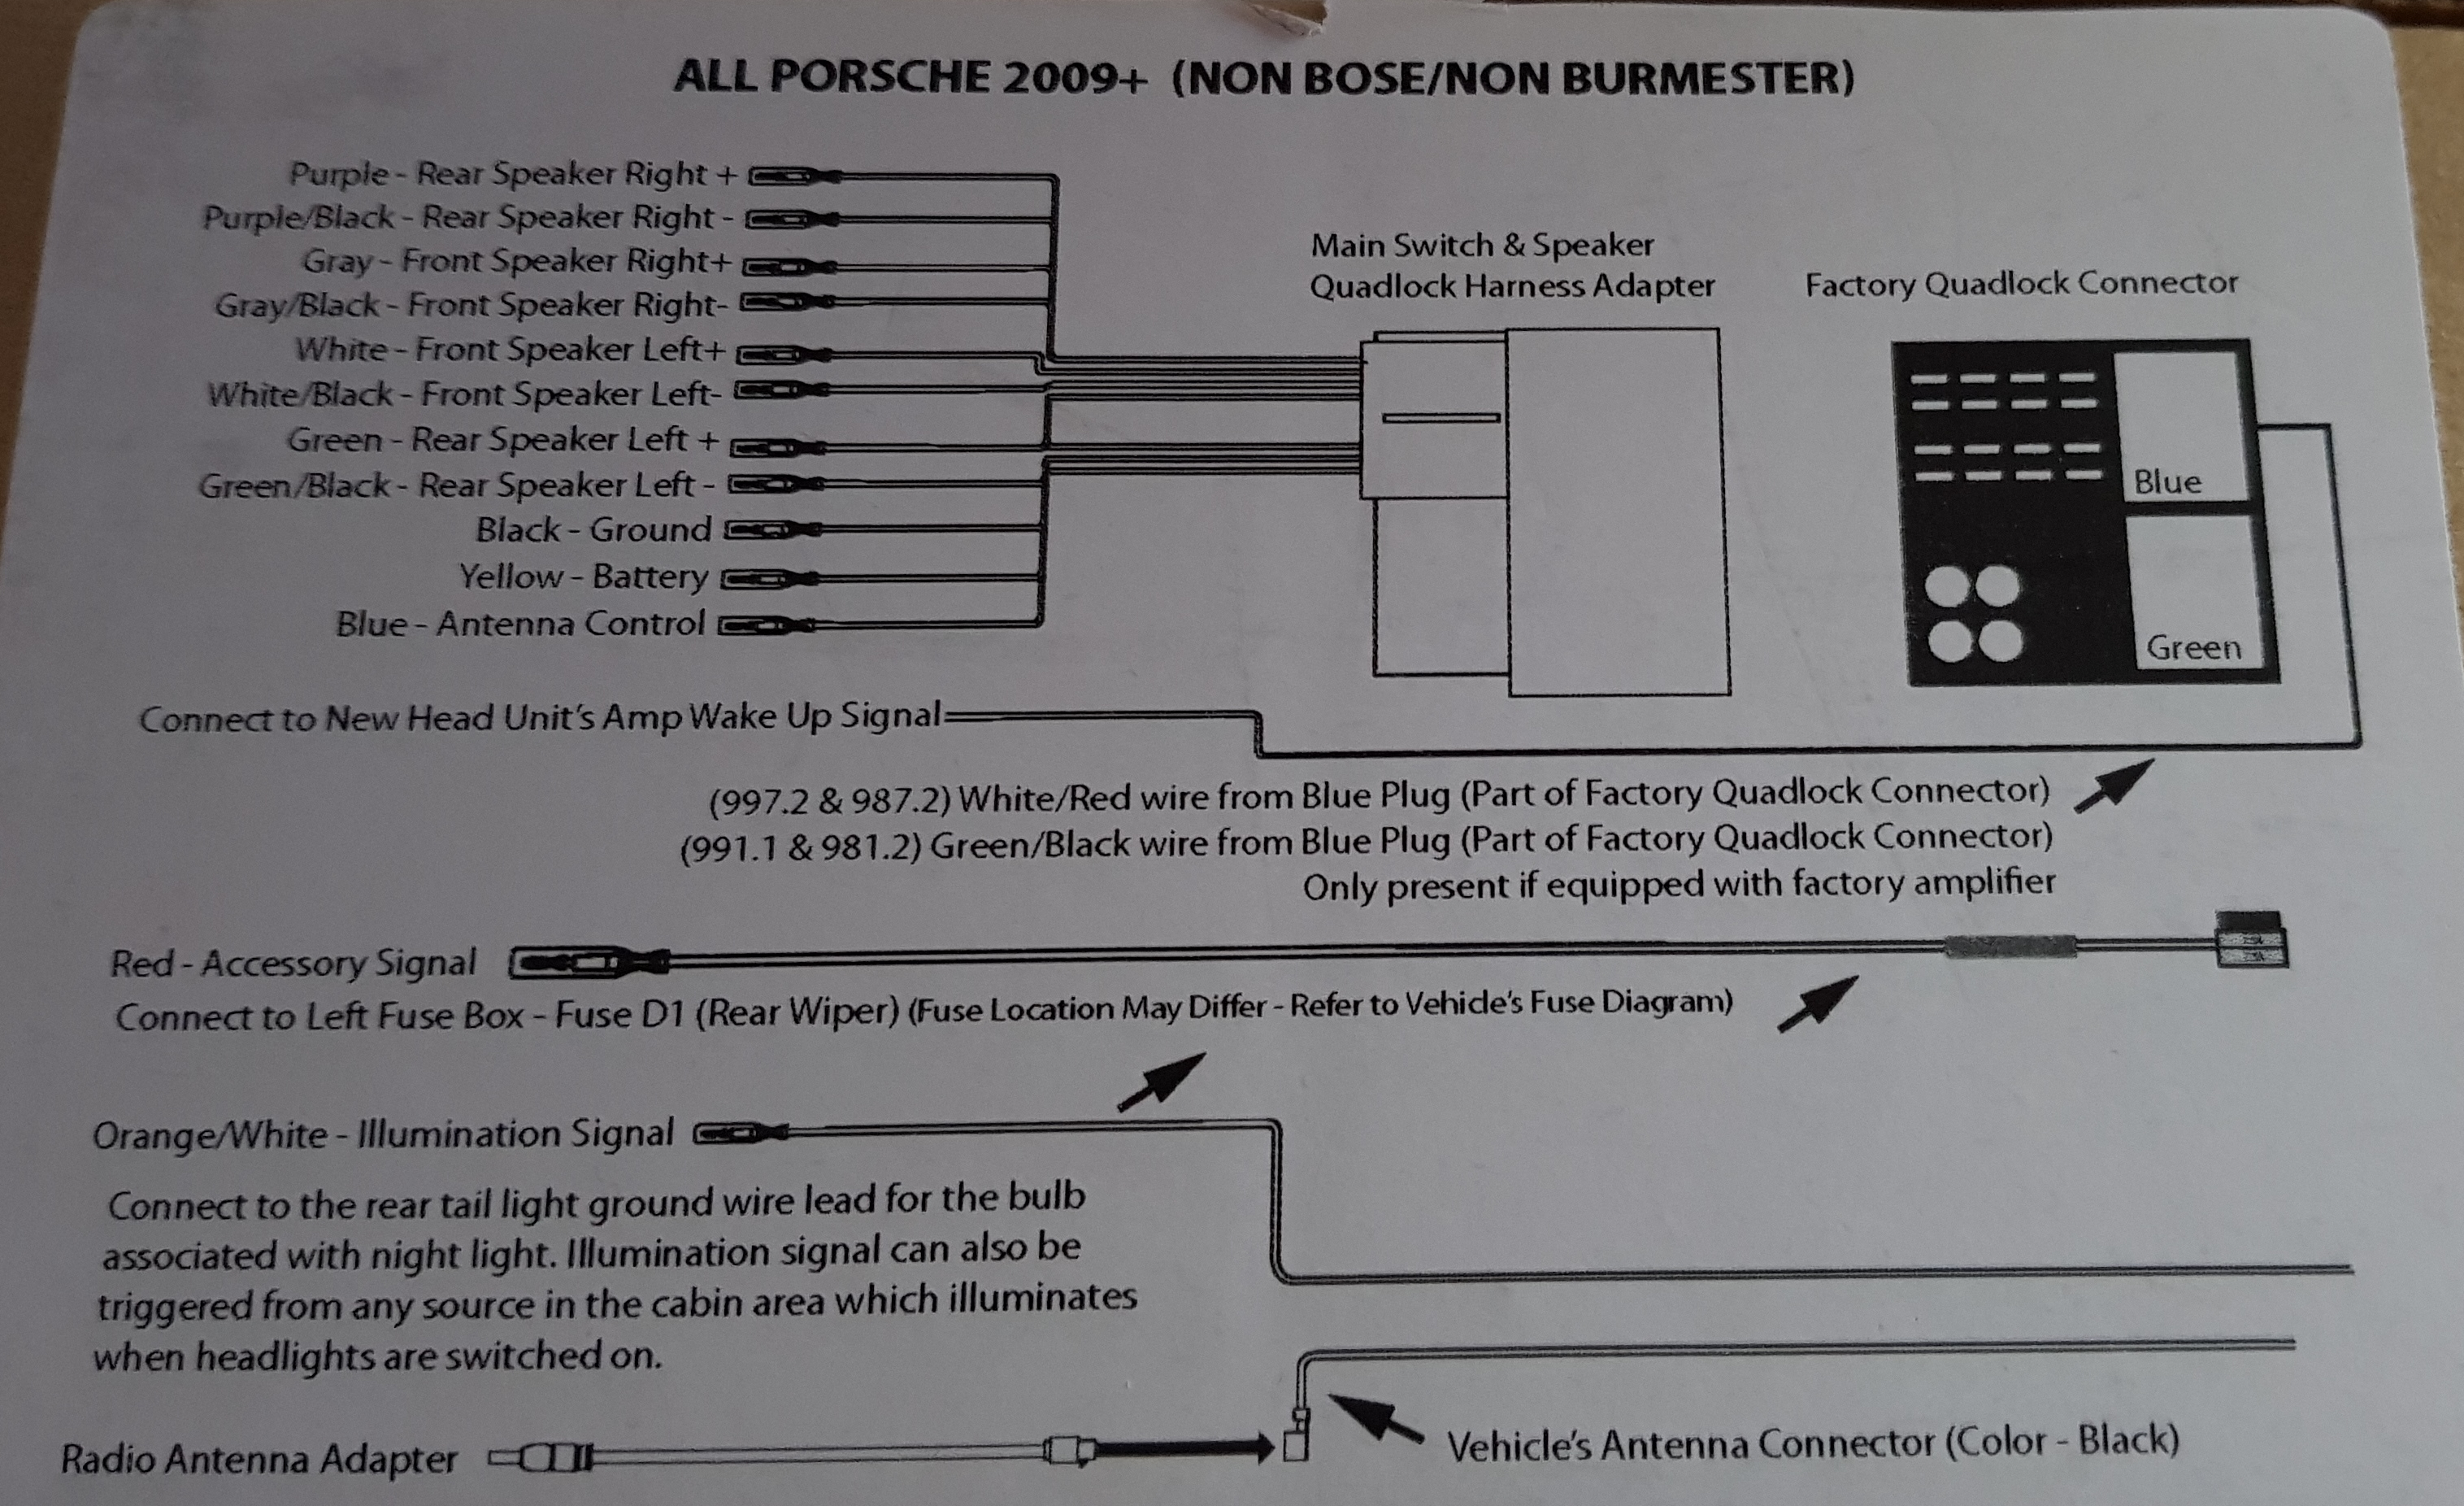 car stereo diagram honda porsche cayman s wiring diagram wiring diagram 986 porsche car stereo diagram